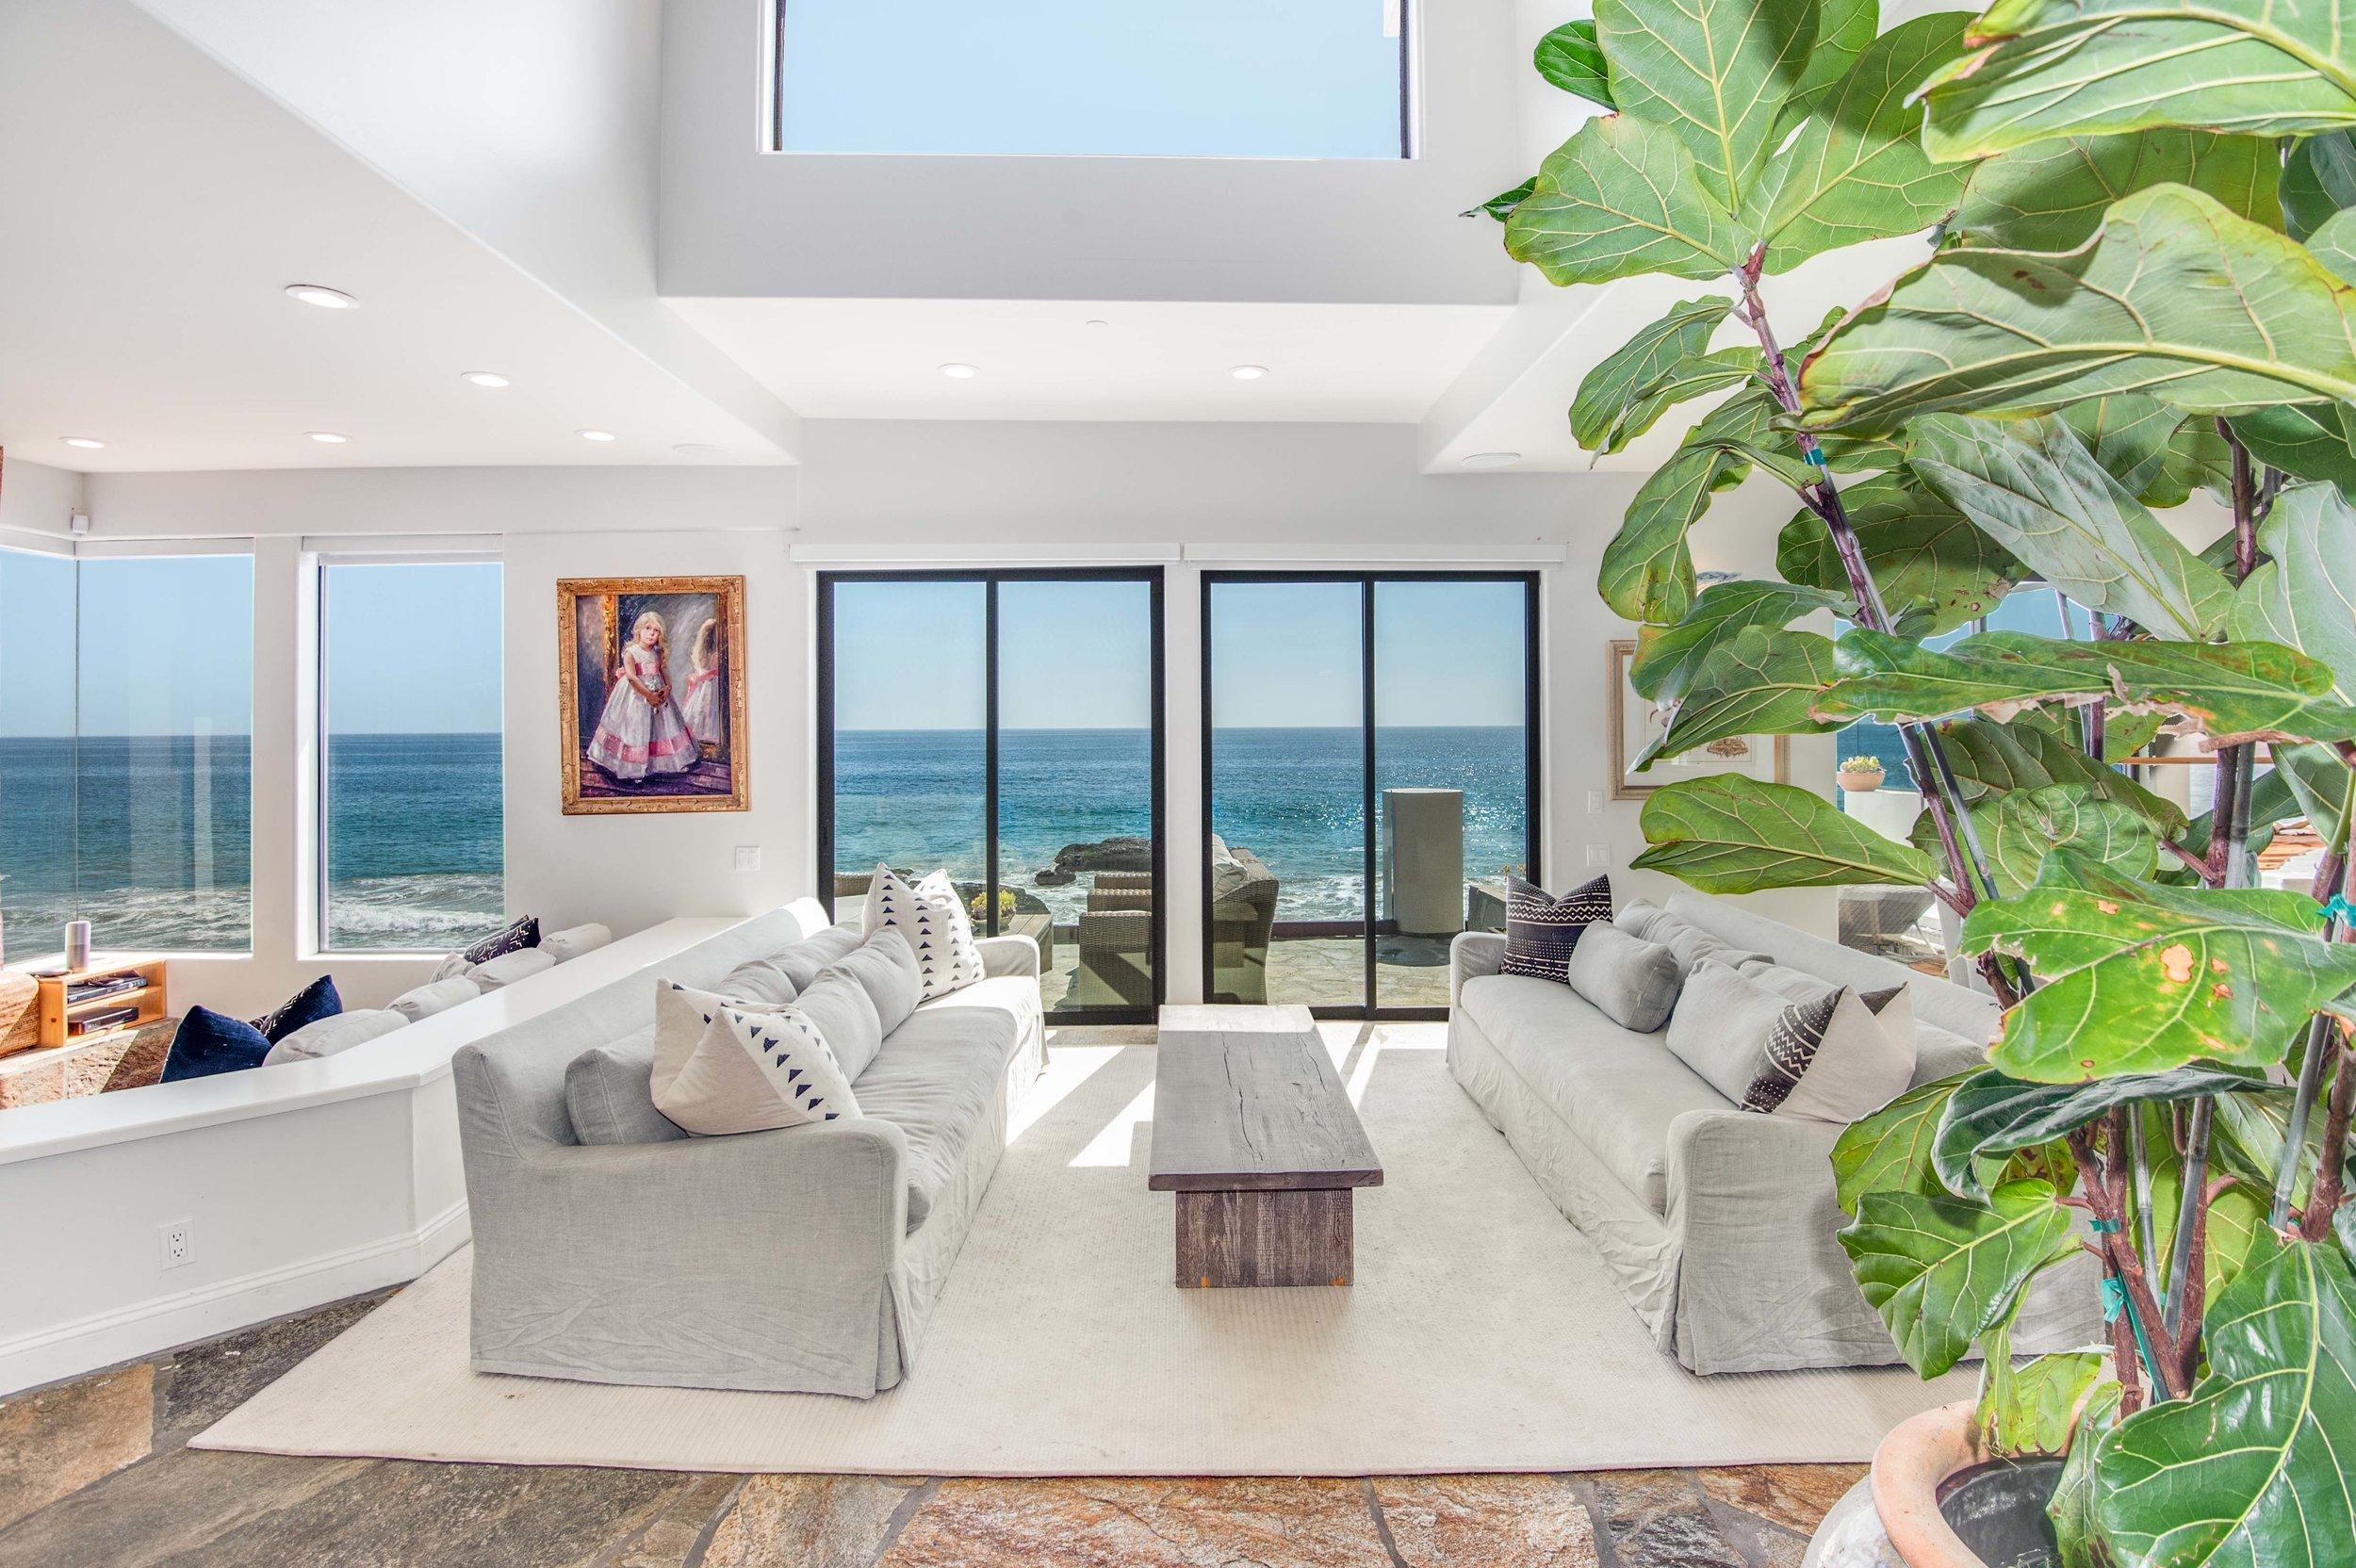 002 Living Room 25252 Malibu Road For Sale Lease The Malibu Life Team Luxury Real Estate.jpg